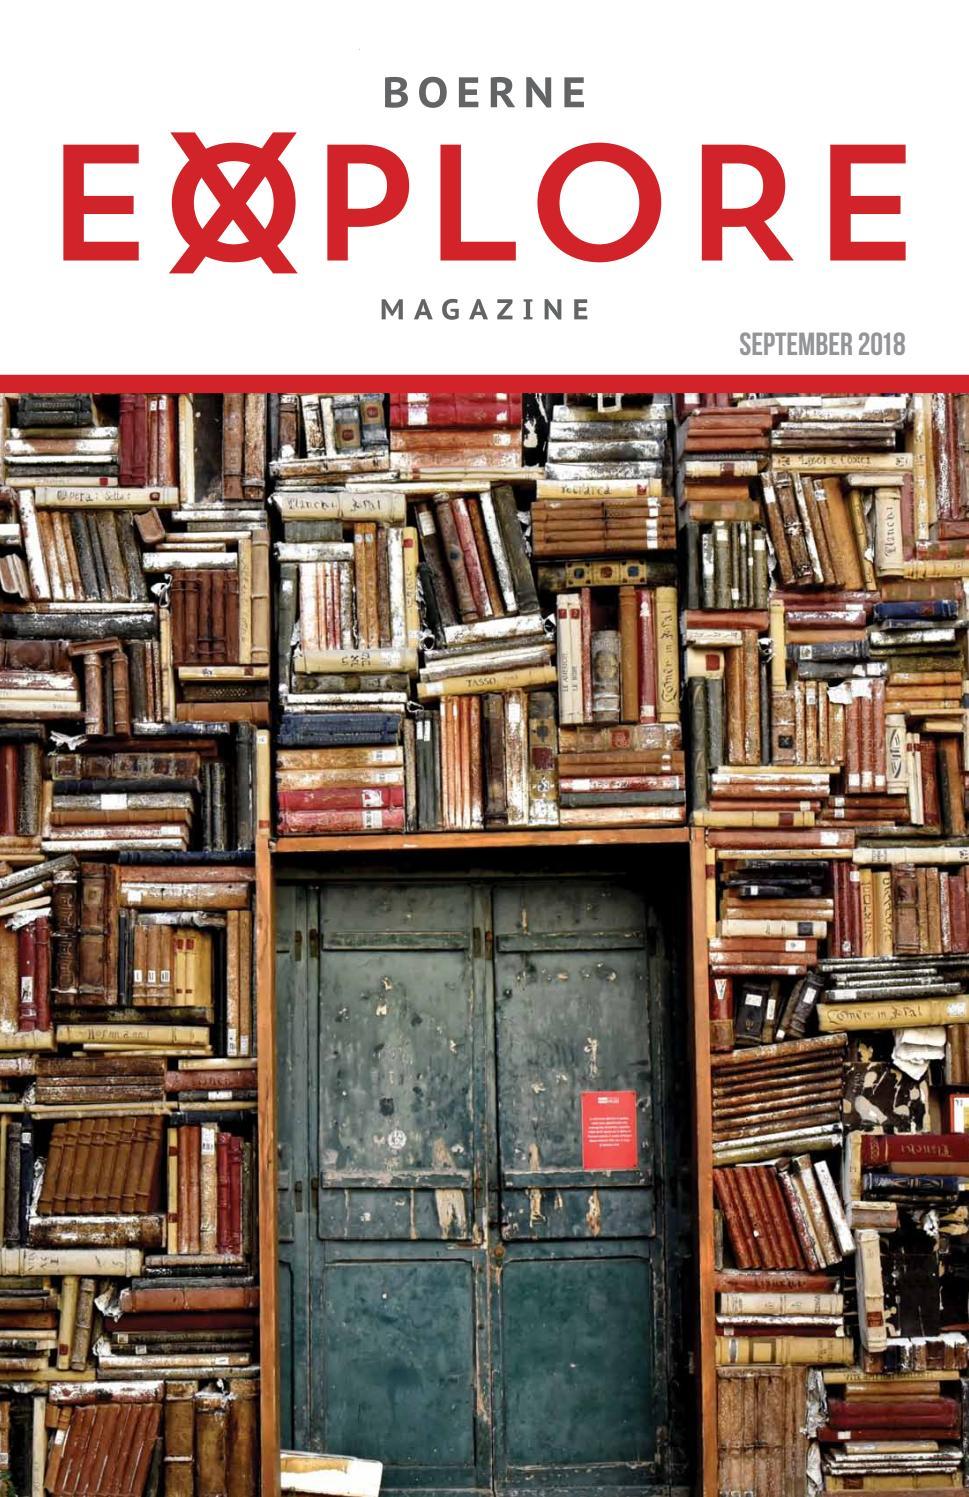 EXPLORE Magazine - September 2018 by Ben Schooley - issuu